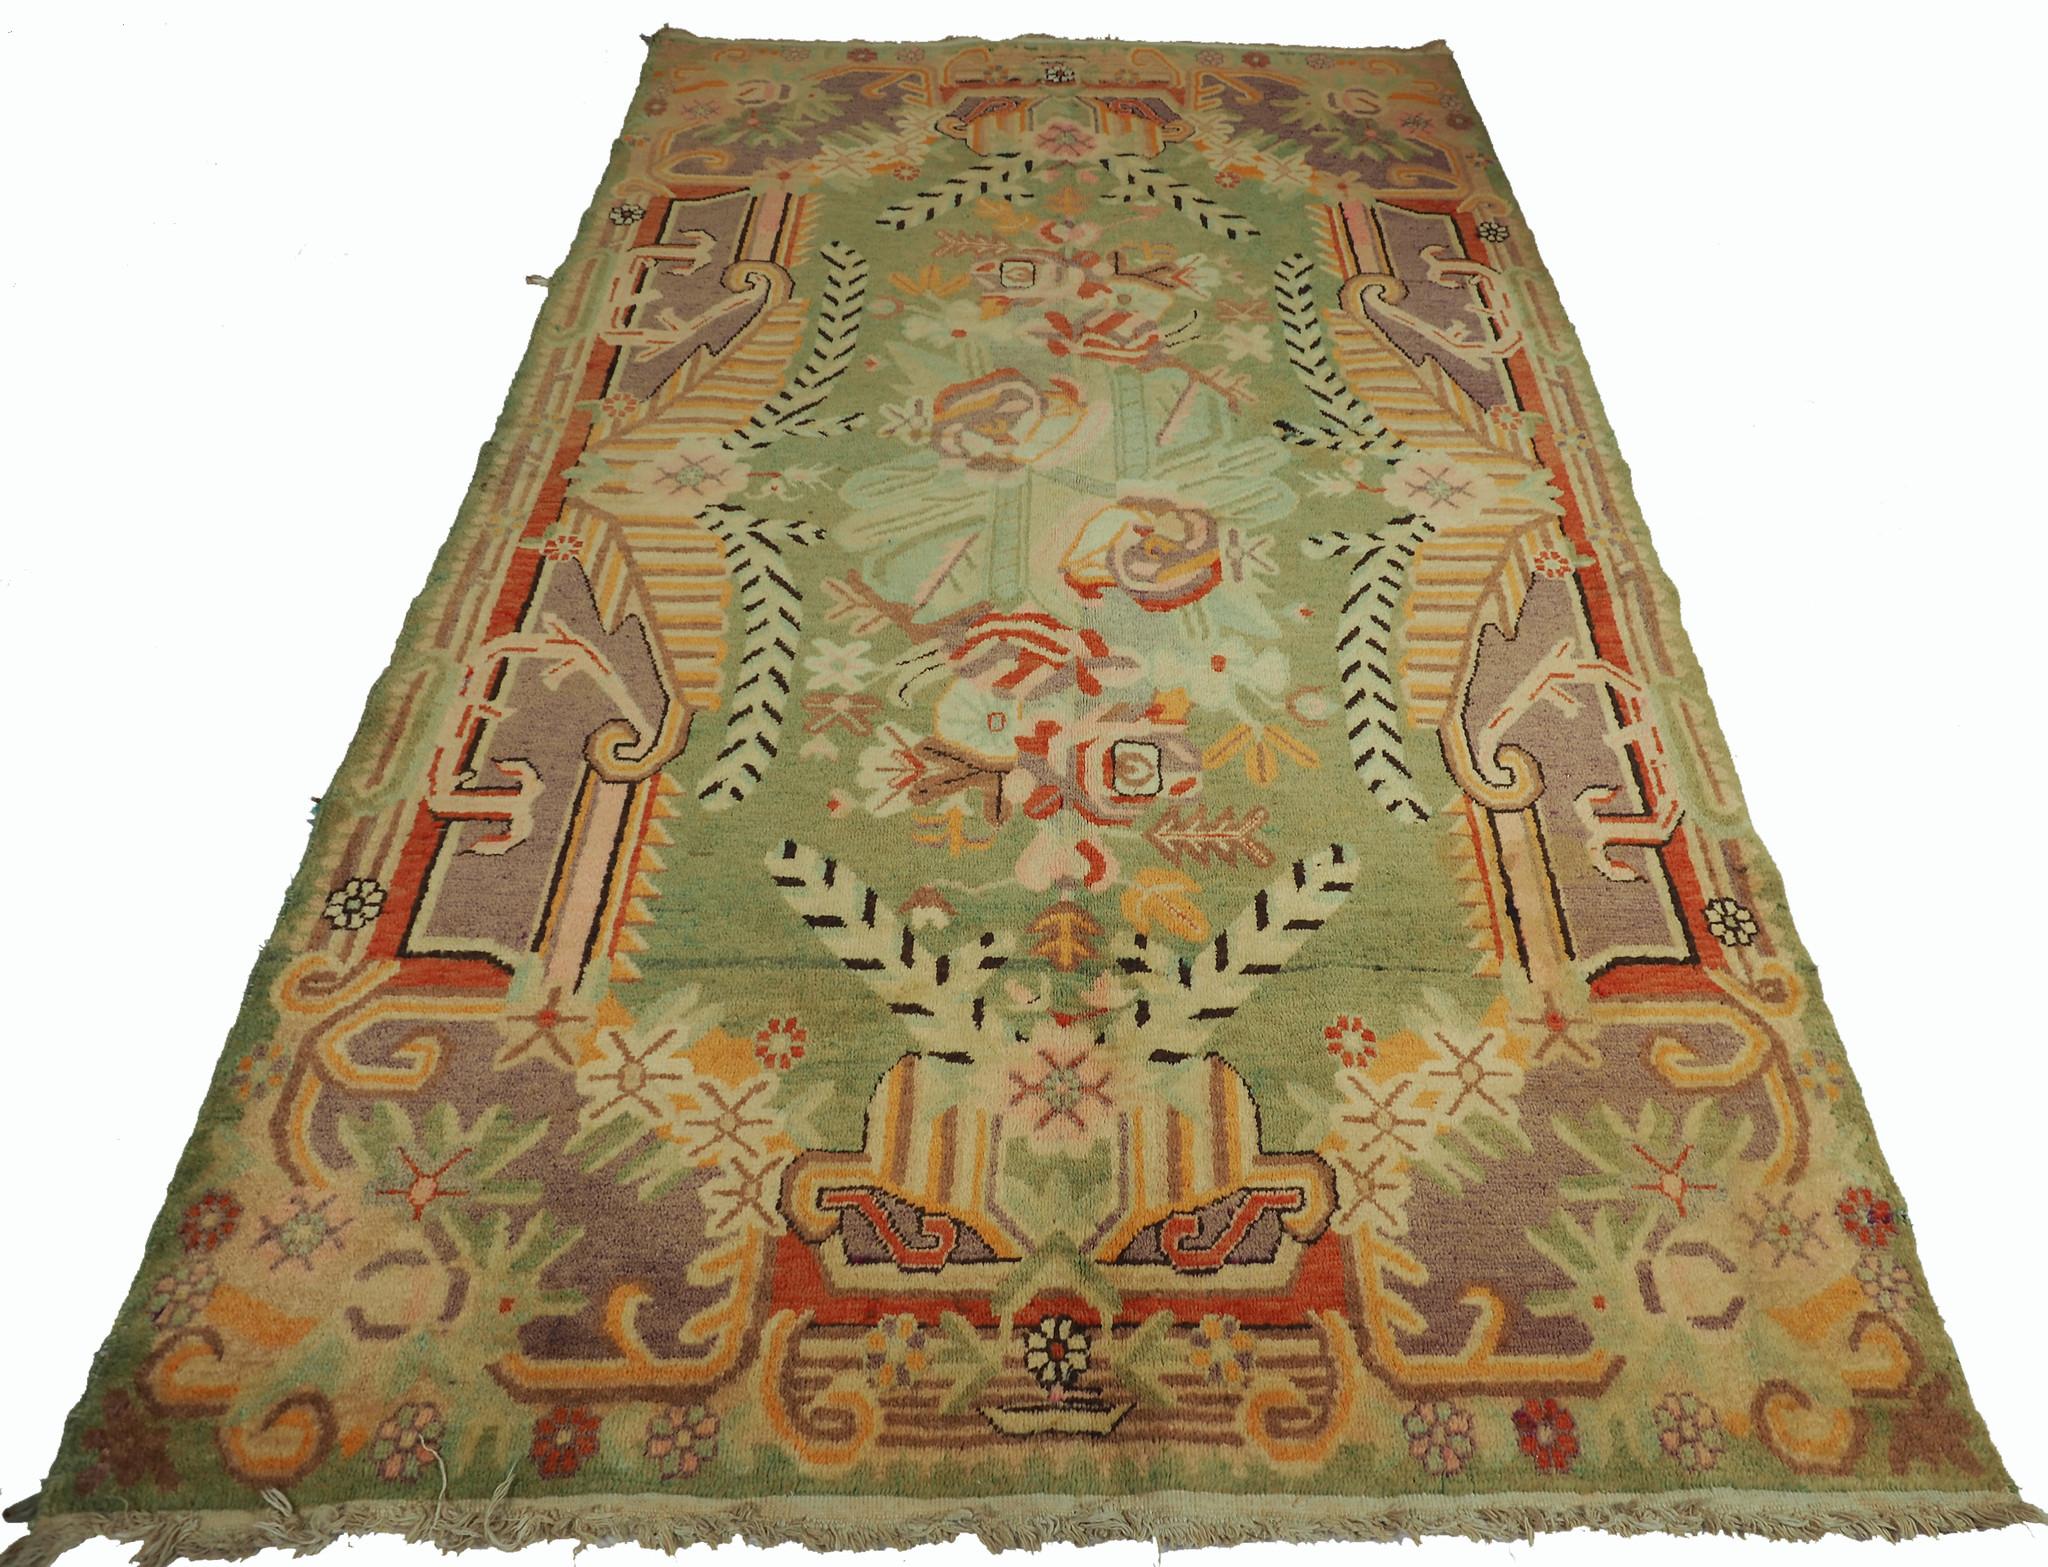 250x143 cm antique Khotan rug Chinese Turkestan No:20/B